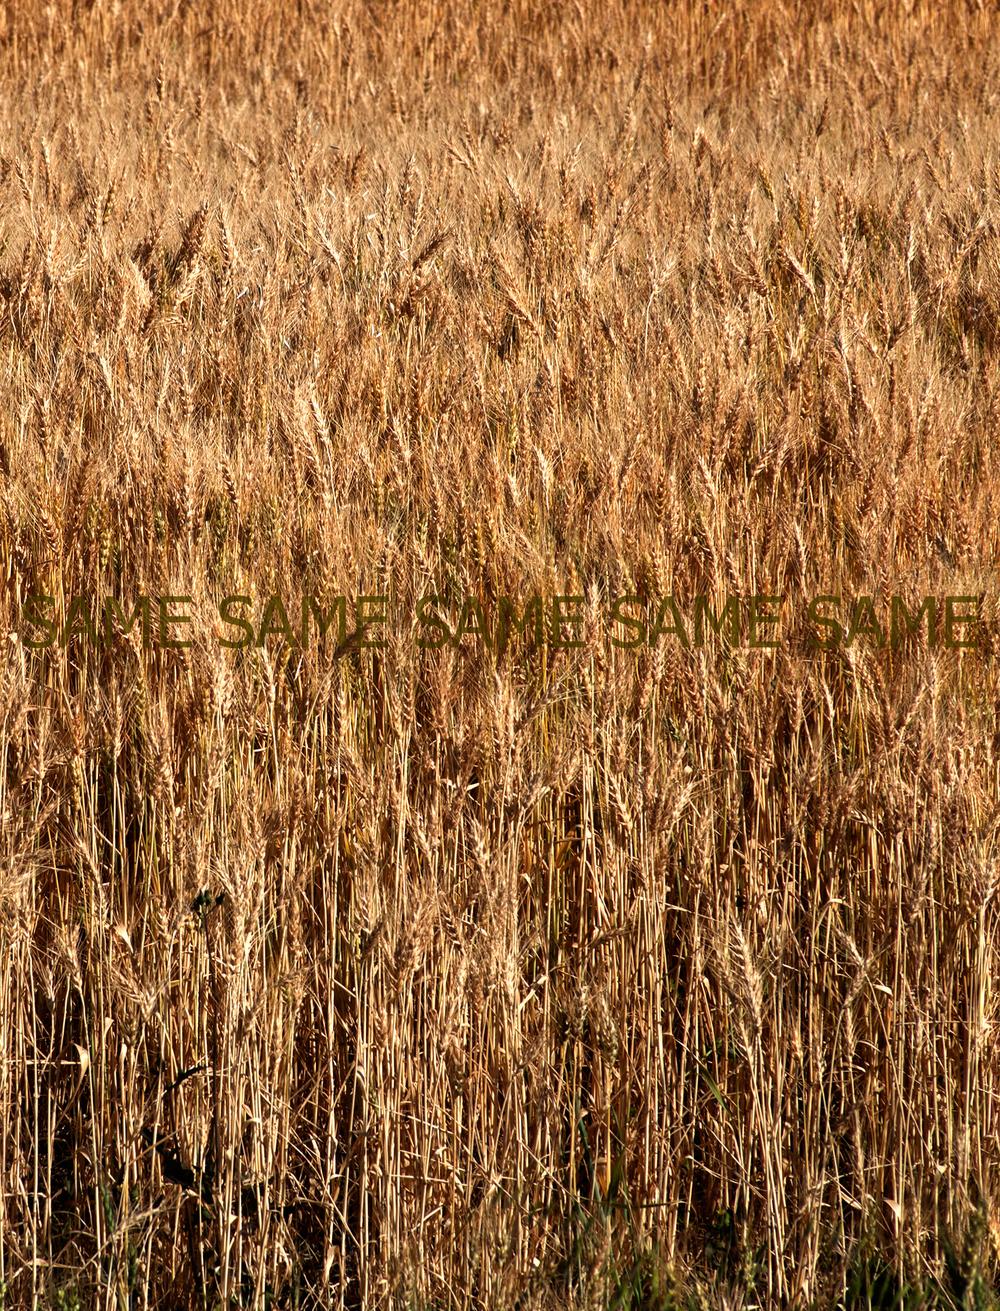 Grain Same